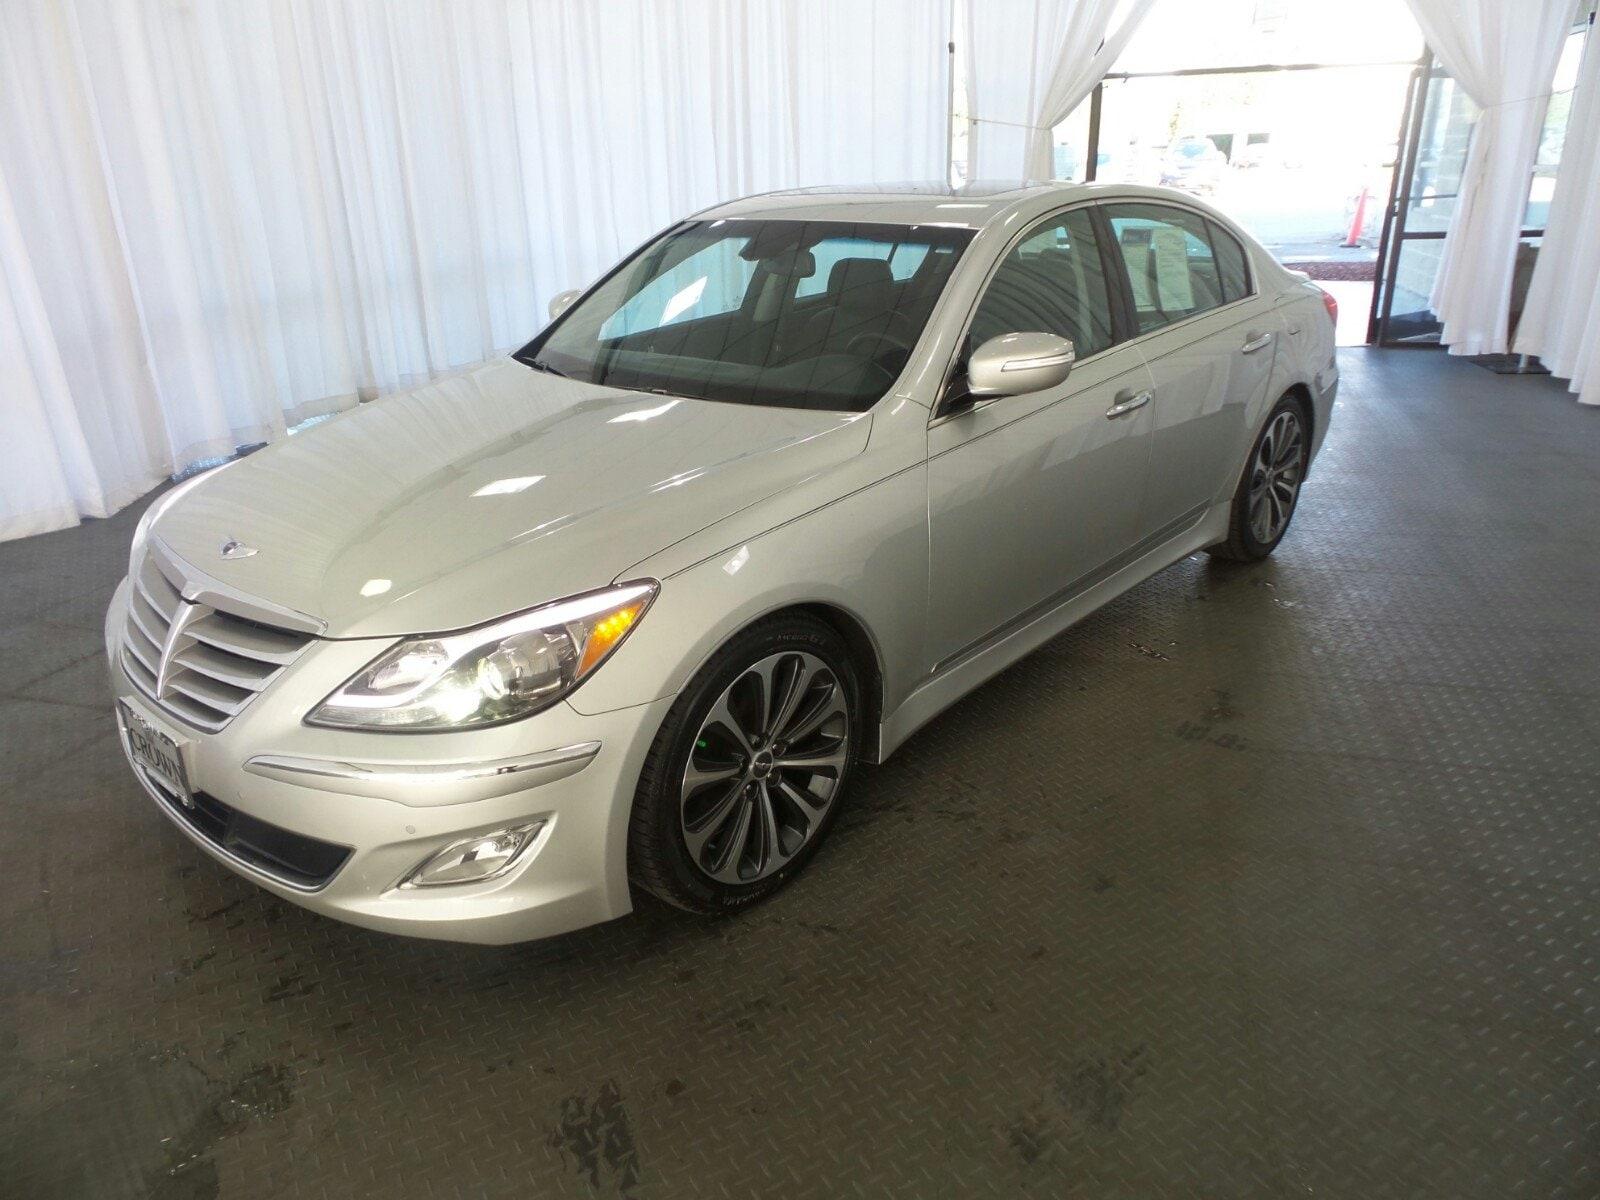 ... Used 2012 Hyundai Genesis 5.0 R Spec (A8) Sedan For Sale In Greensboro  ...